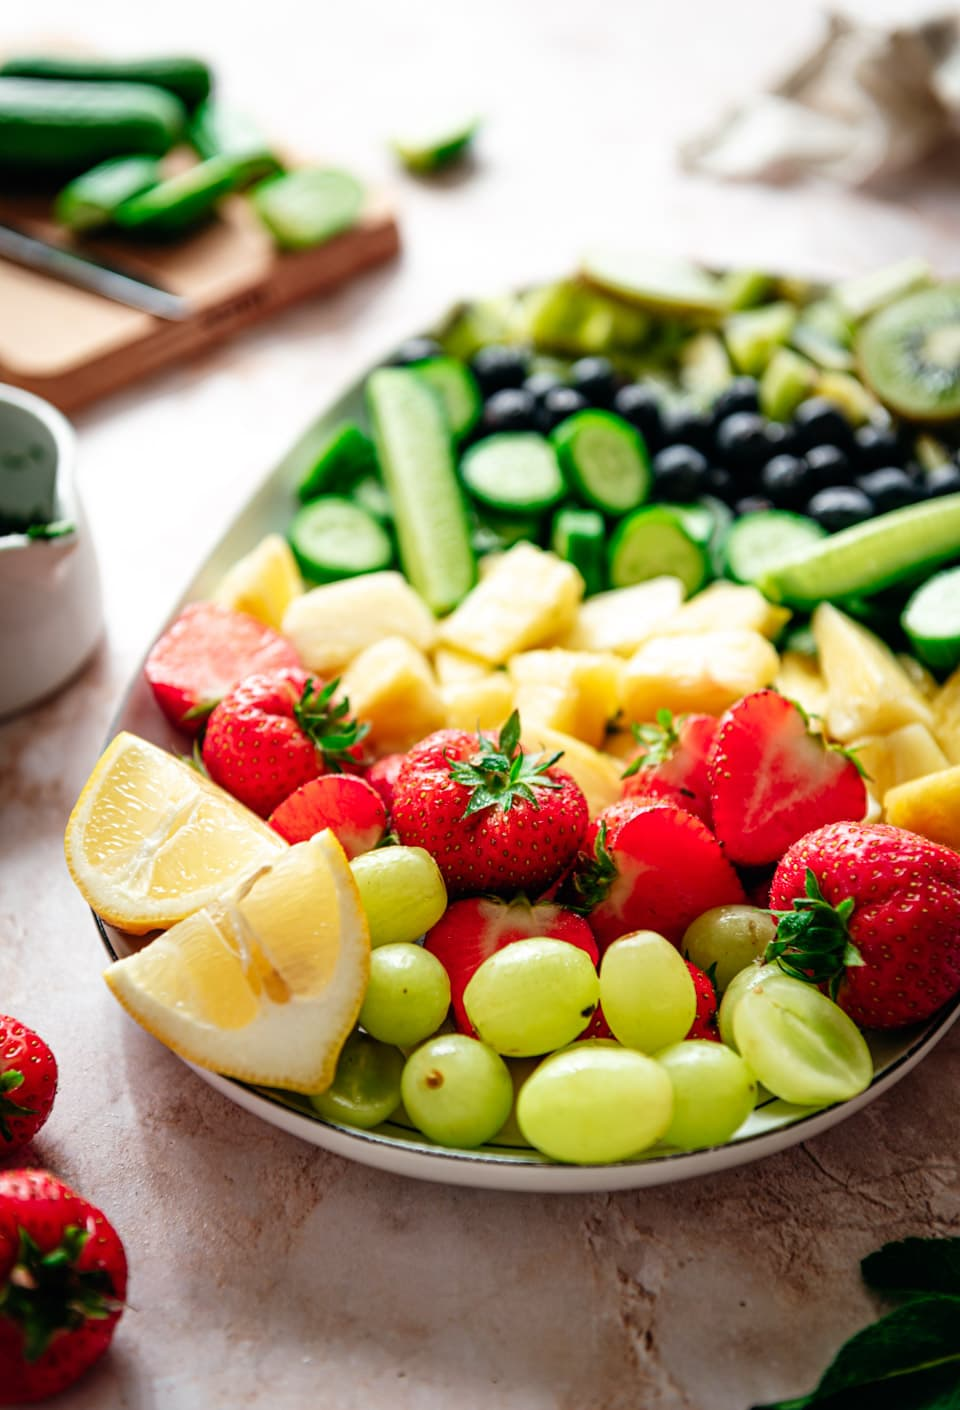 Zelf een fruitsalade maken